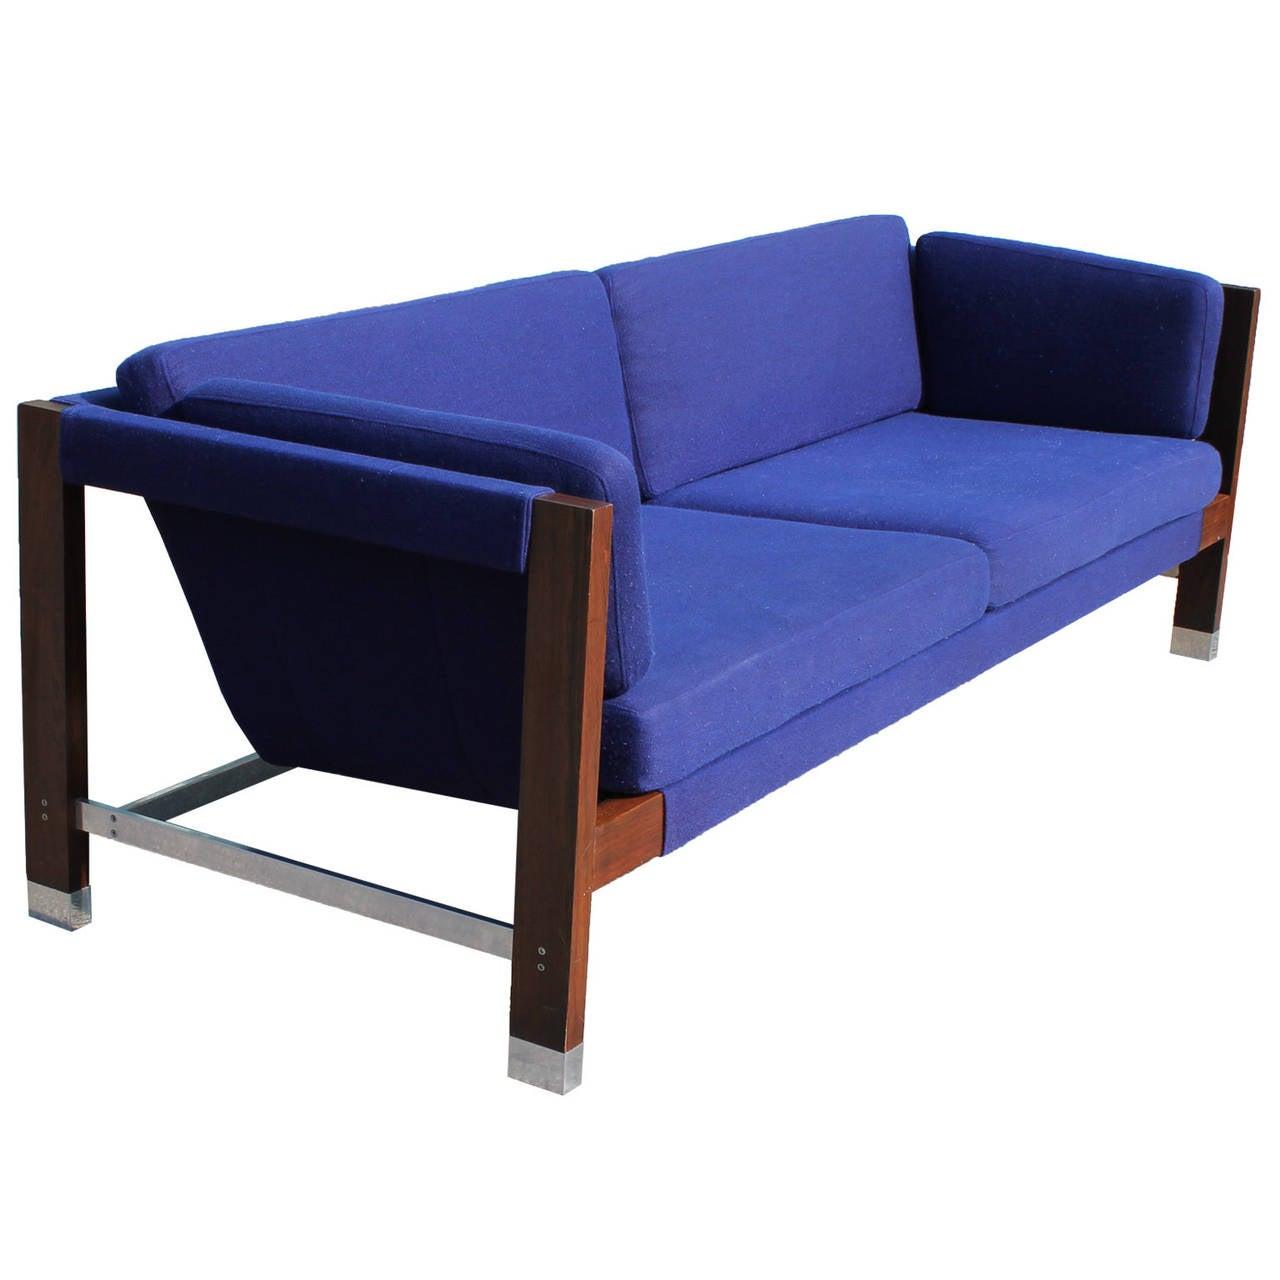 Milo Baughman Rosewood and Chrome Blue Sling Sofa at 1stdibs